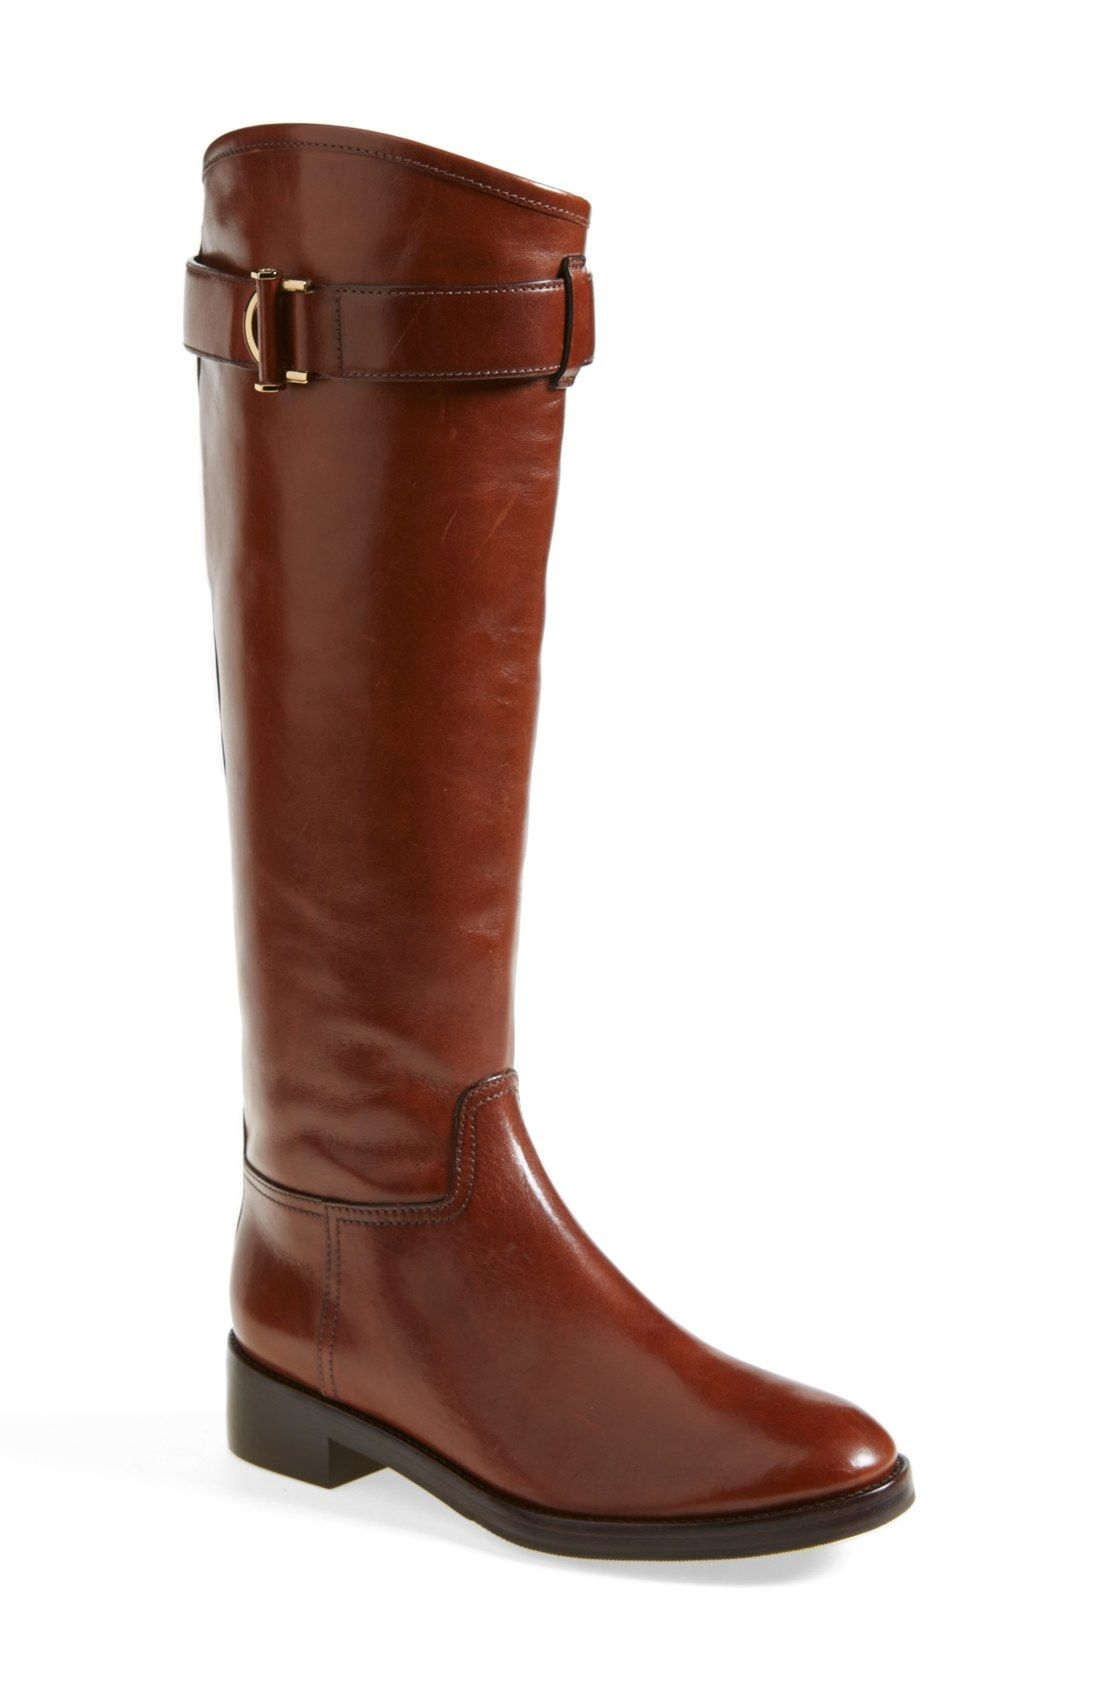 afb533fffa5 Wearing these Tory Burch riding boots all season!   Fall Fashion ...